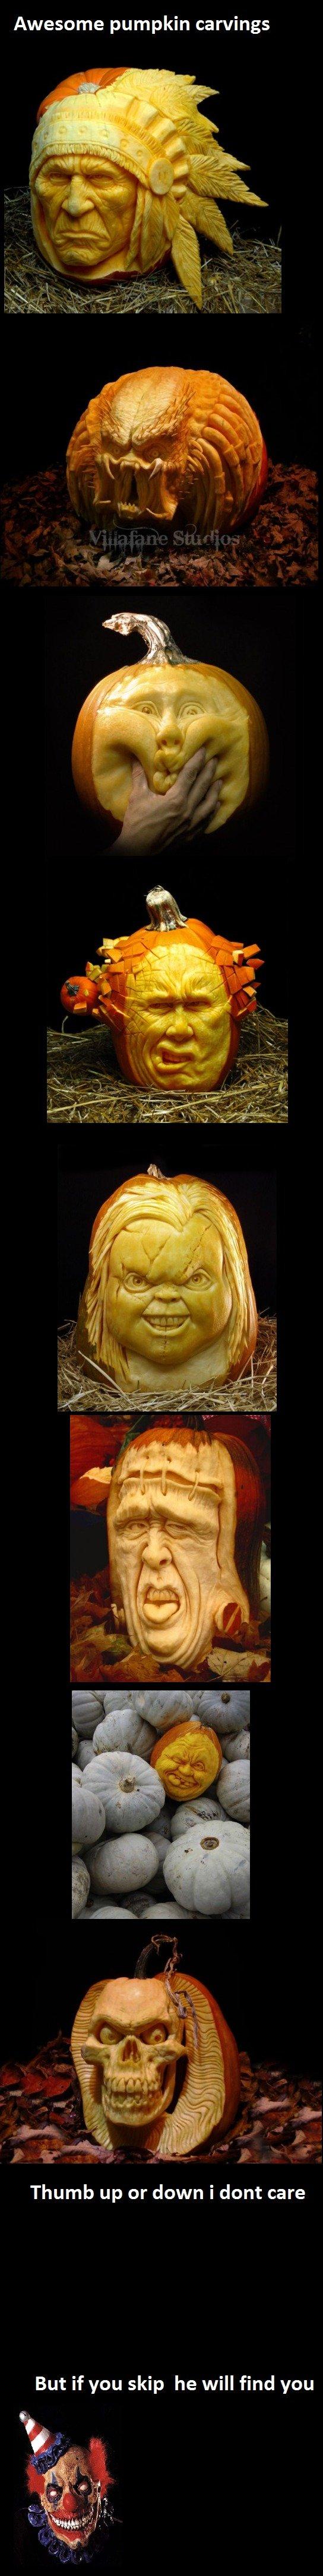 Cool pumpkin carvings PT1. PT2 - www.funnyjunk.com/funny_pictures/2769847/Cool+pumpkin+carvings+PT2/ PT3-www.funnyjunk.com/funny_pictures/2771108/Cool+pumpkin+c this is how you